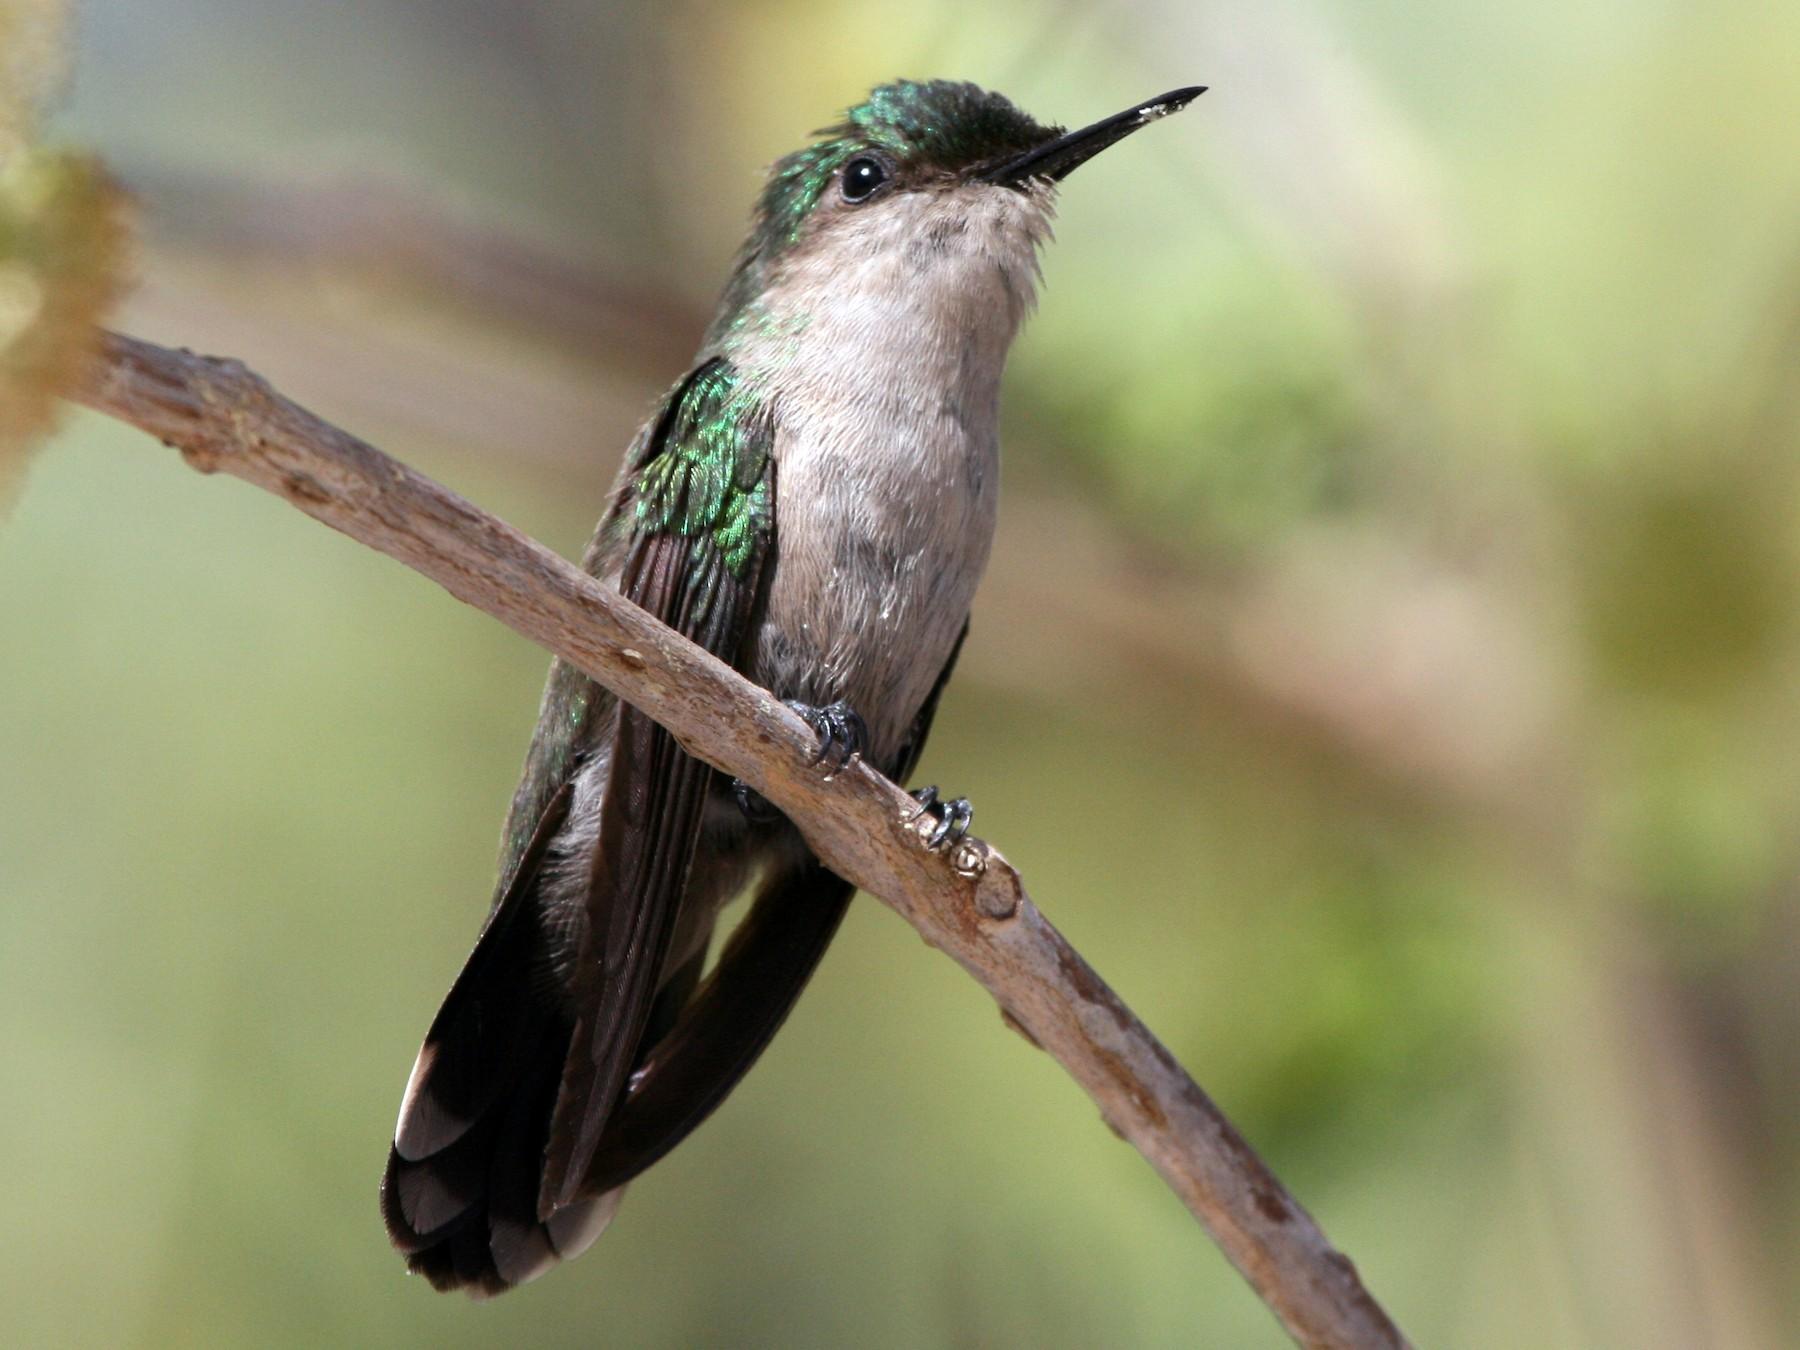 Antillean Crested Hummingbird - James (Jim) Holmes